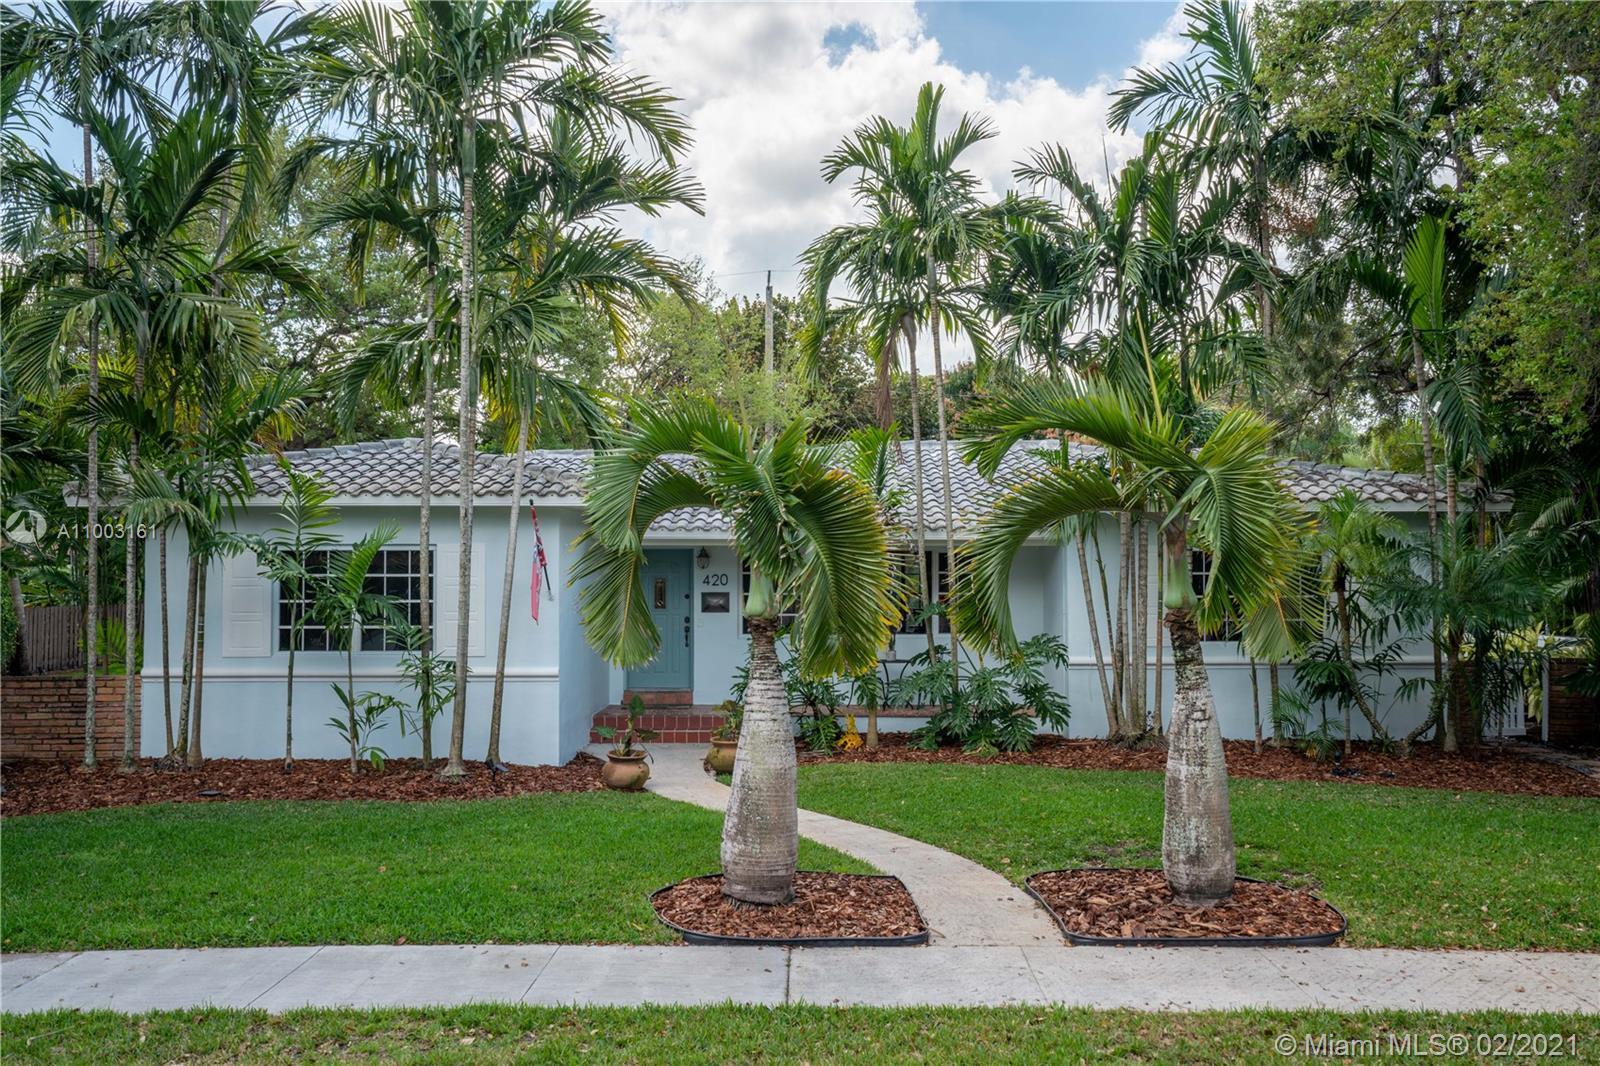 Miami Shores # - 40 - photo